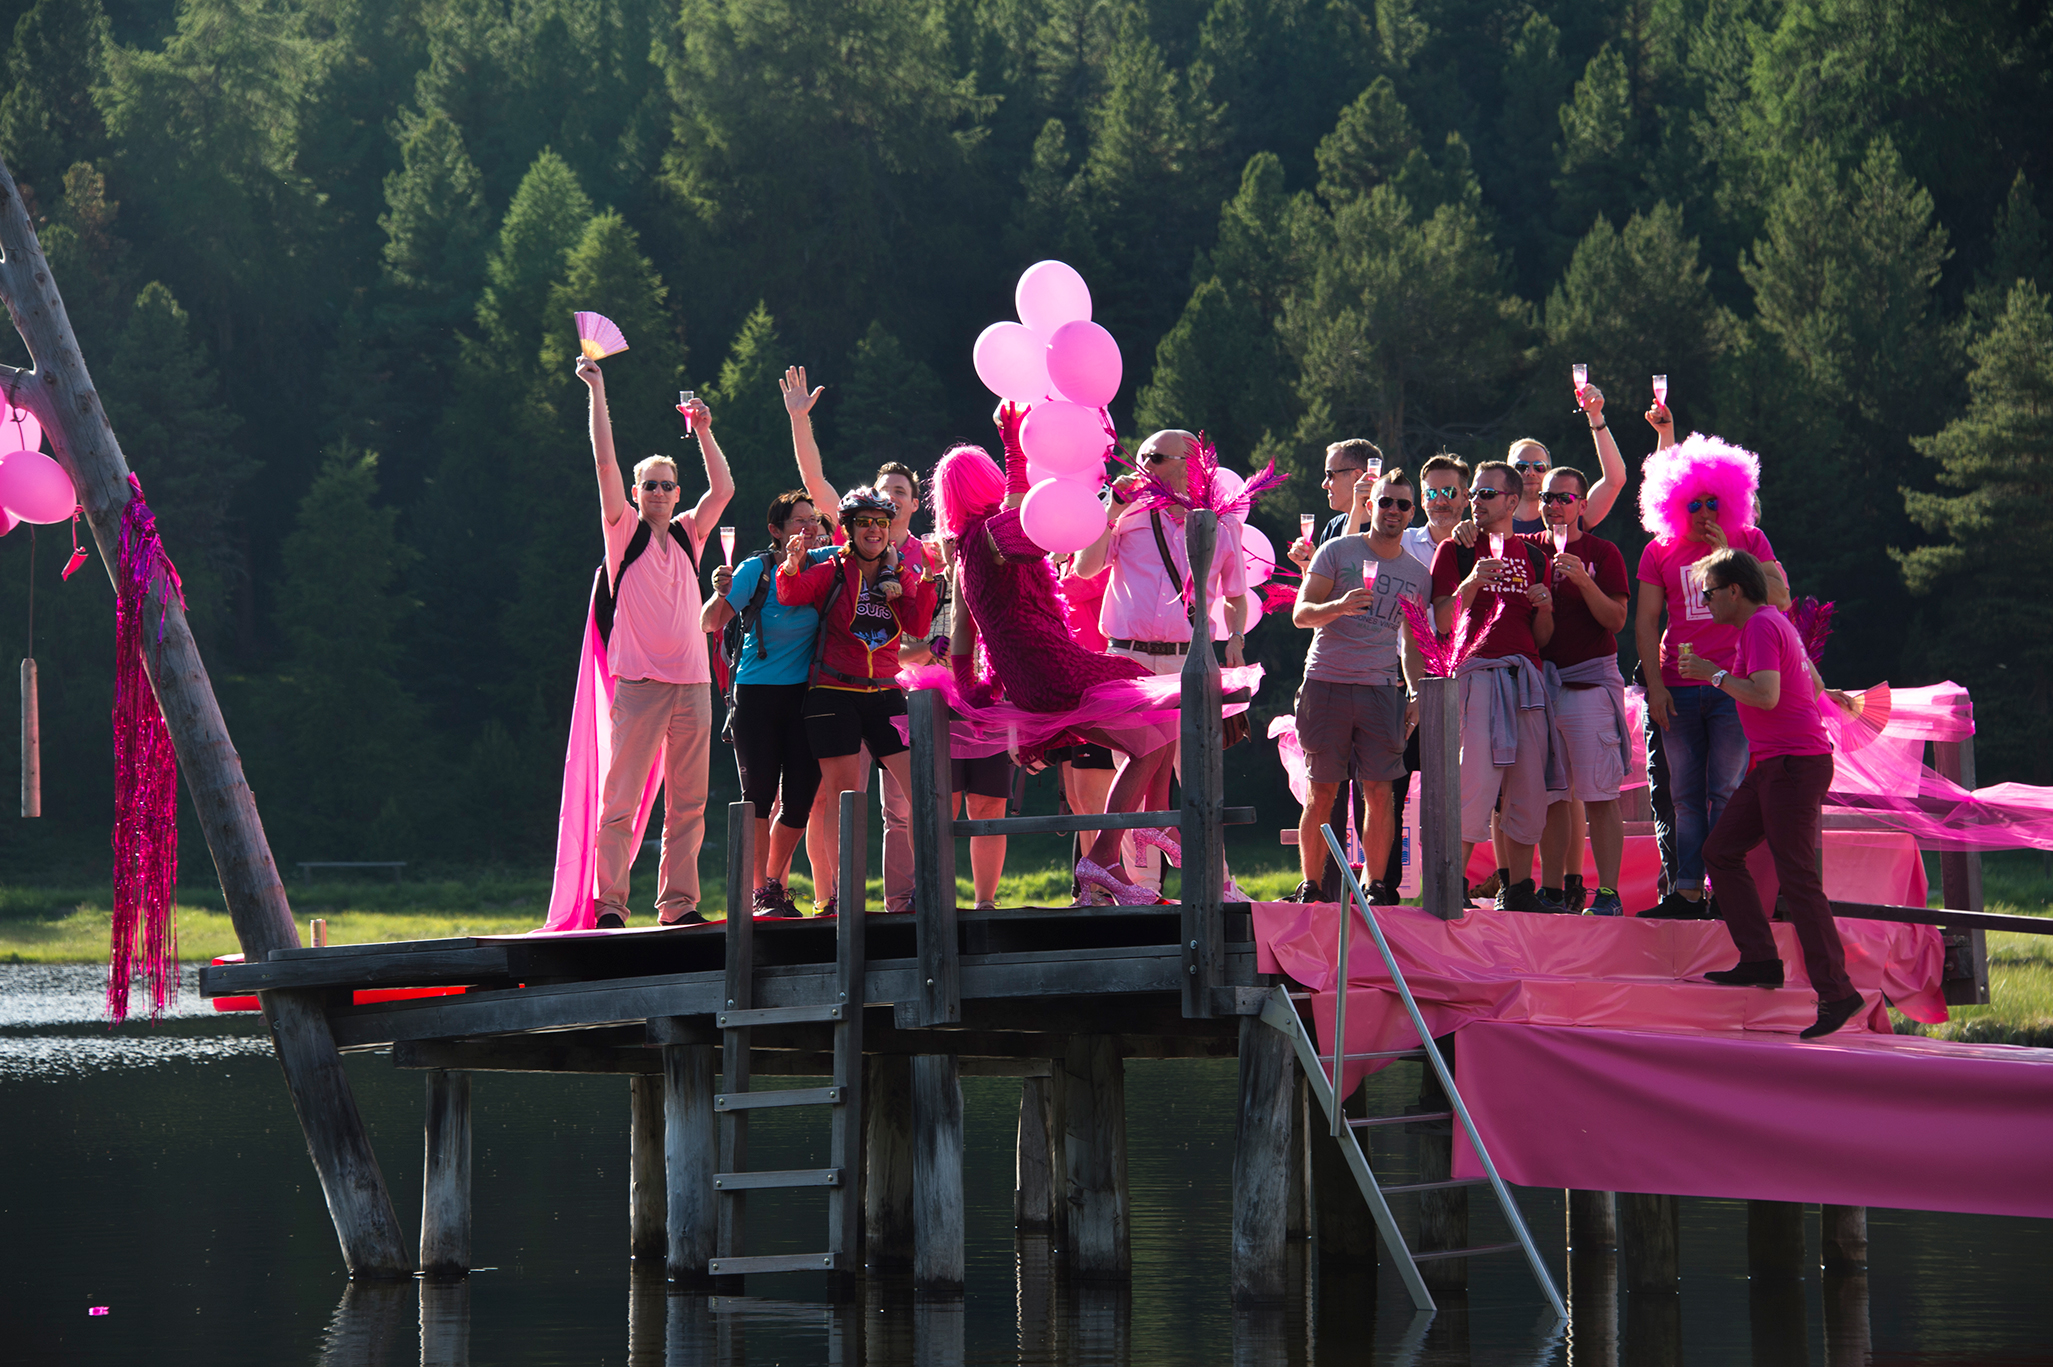 pink-pier-parade-2016-abendstimmung.jpg